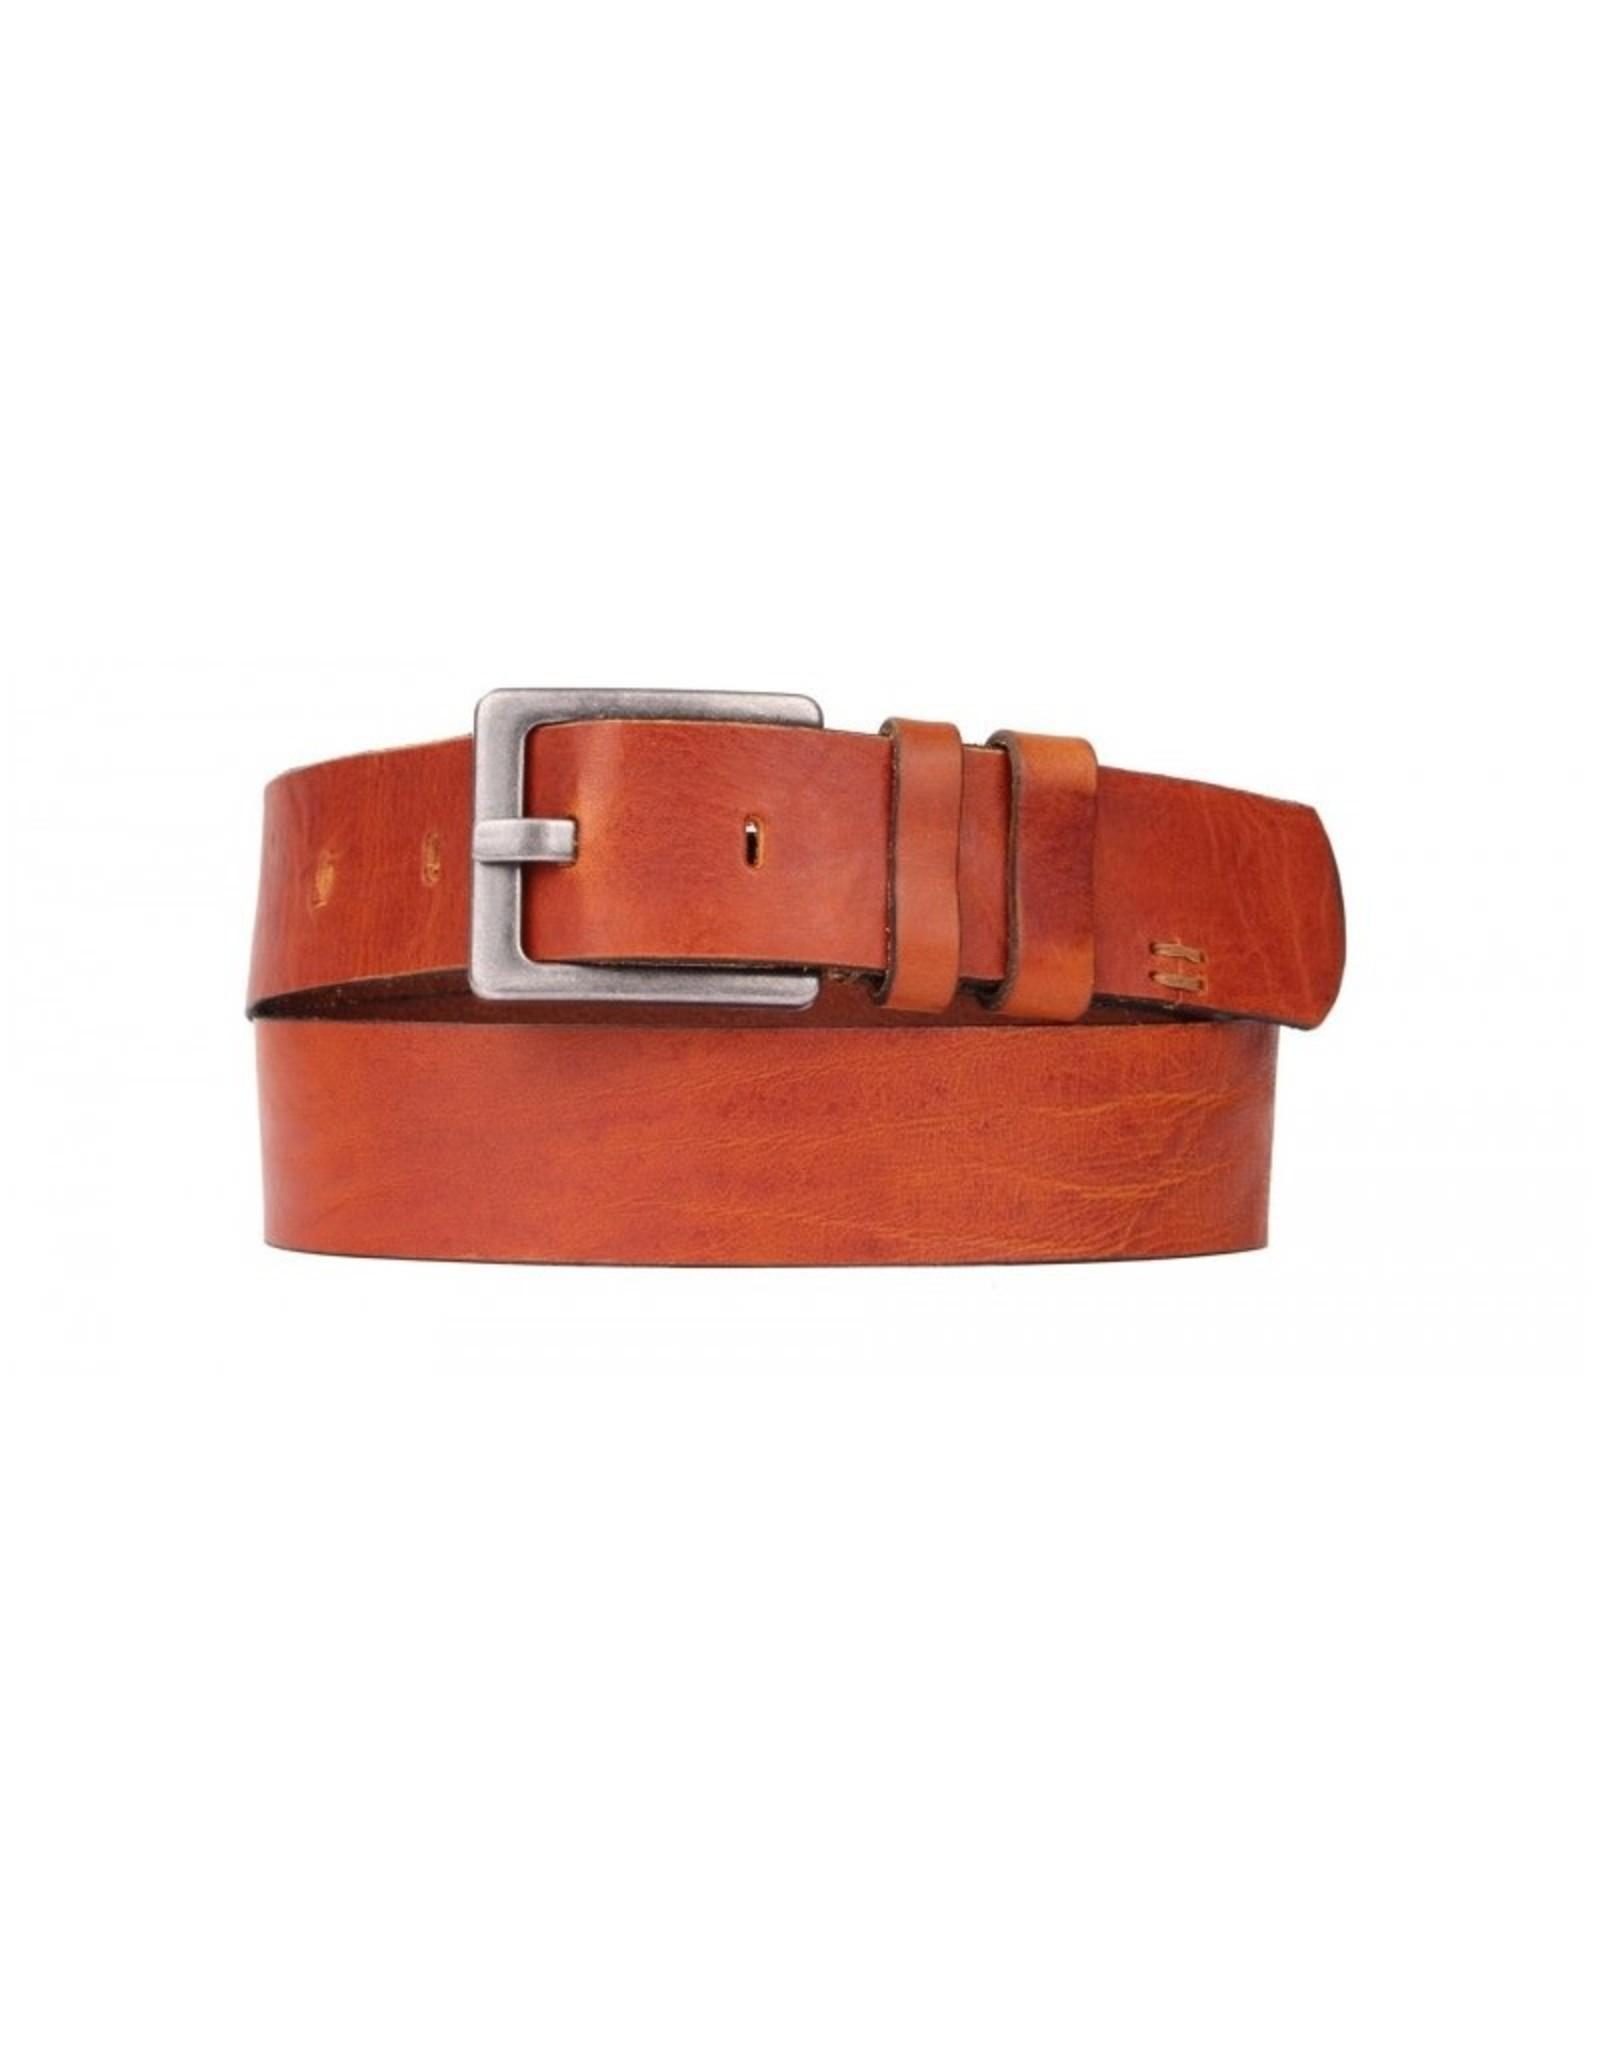 Legend Legend belt Cognac 40493